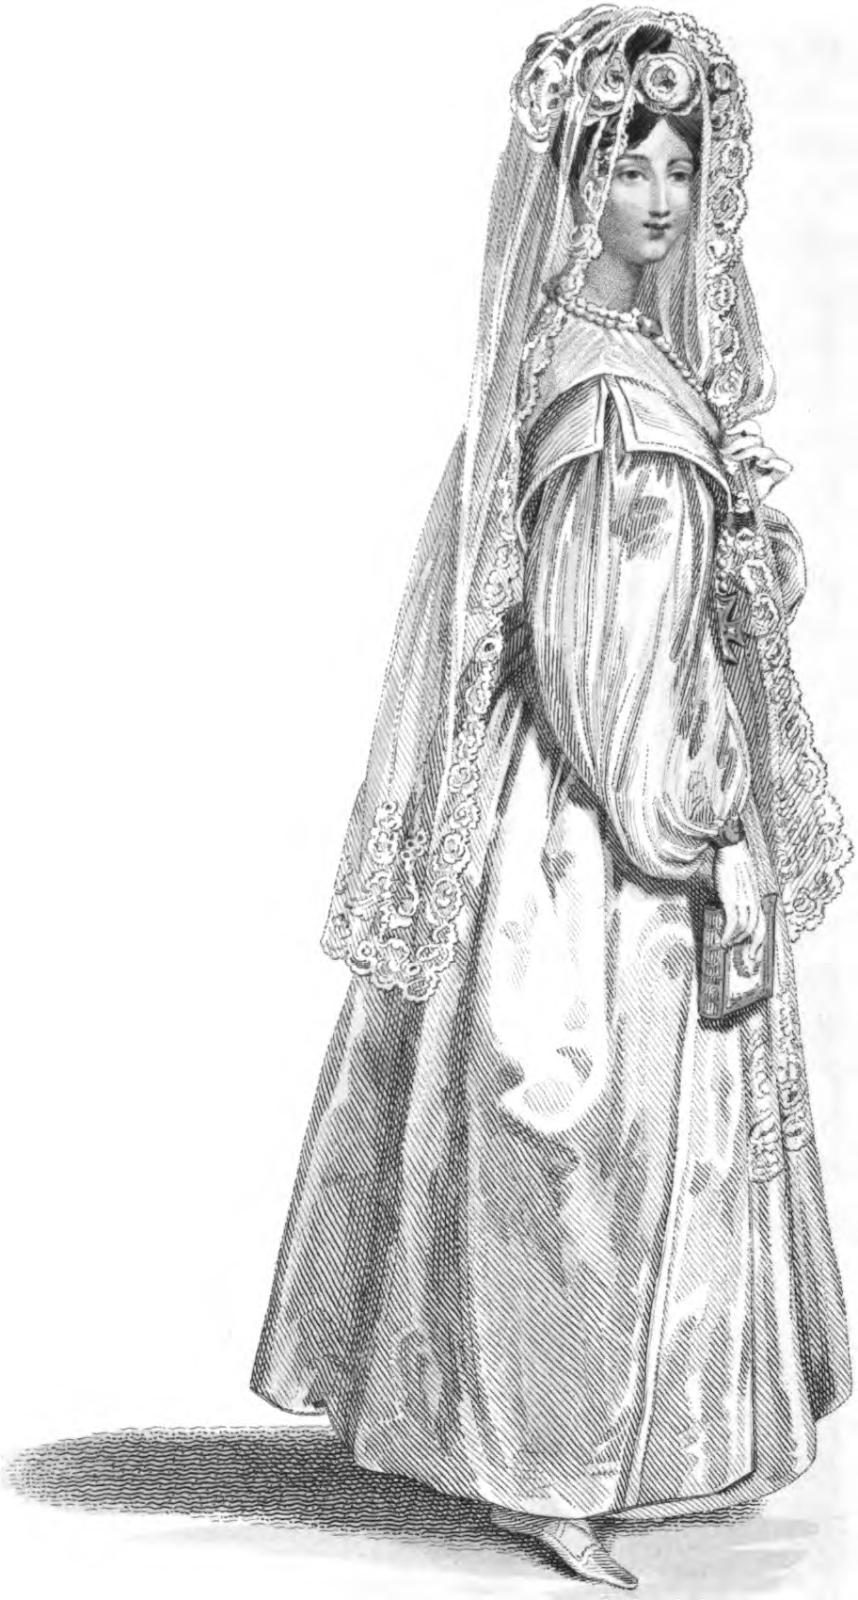 19th century heroines